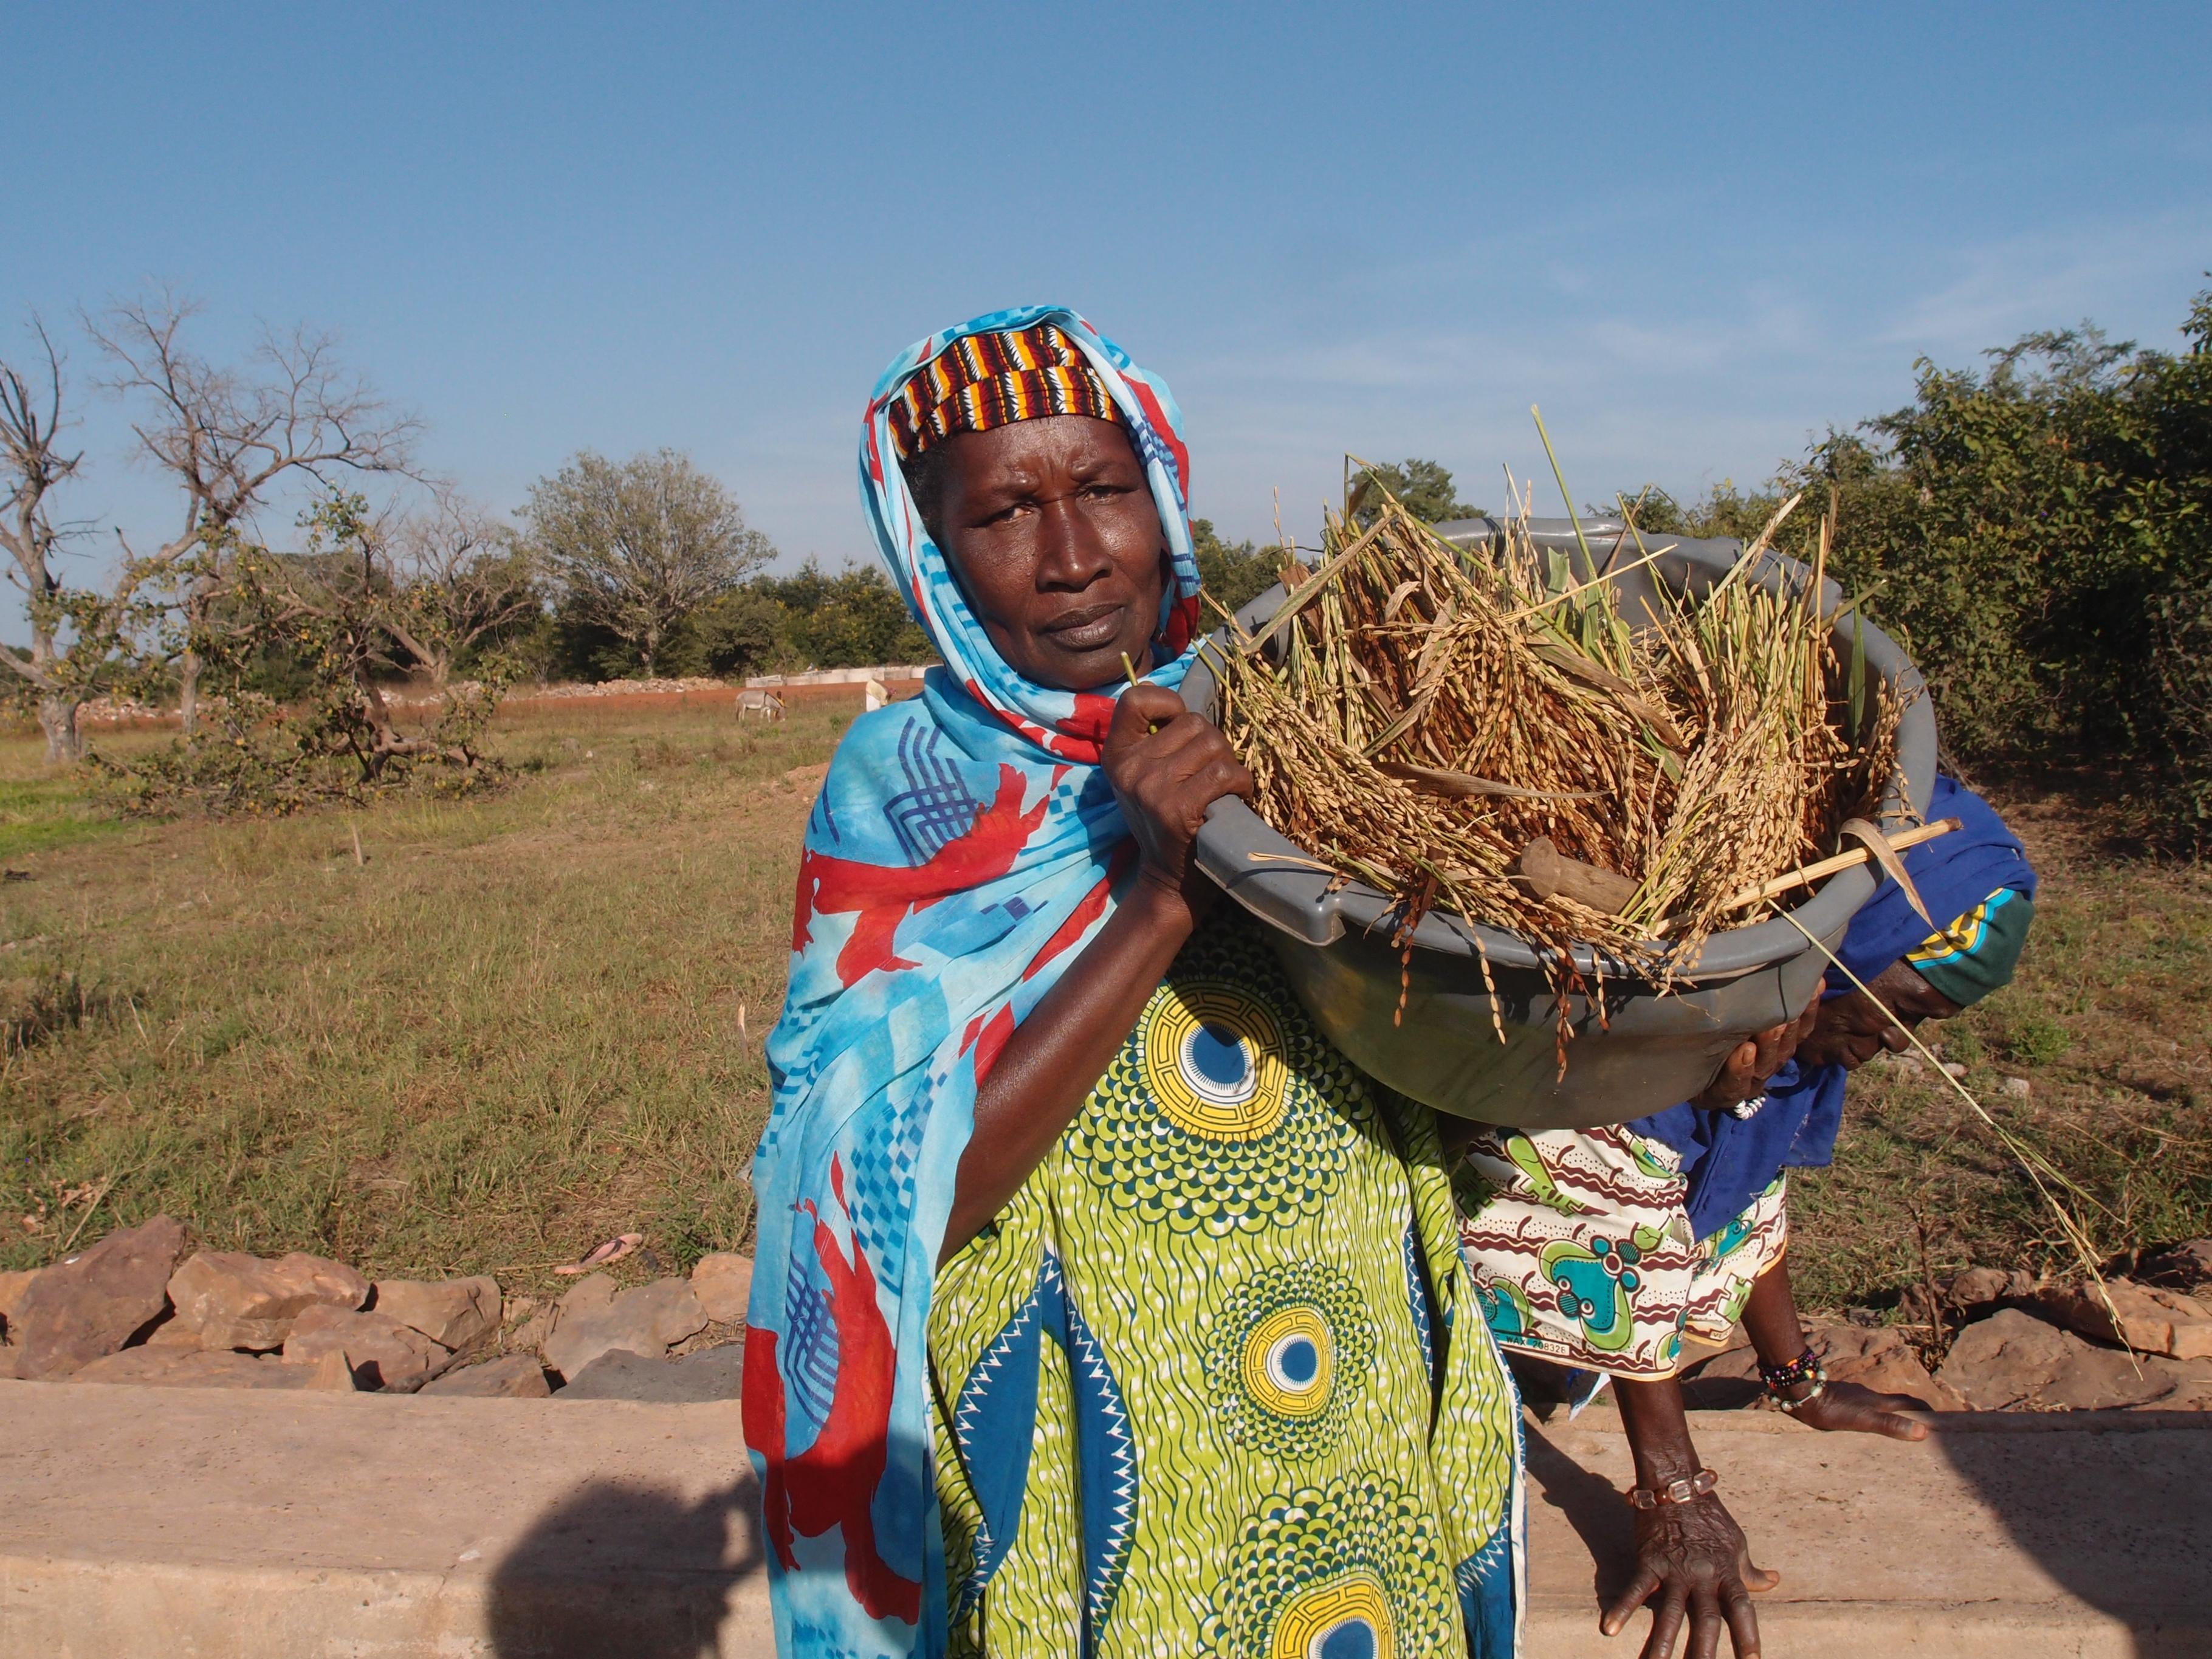 Frau mit Reispflanzen: Reisanbau in Kita in Mali